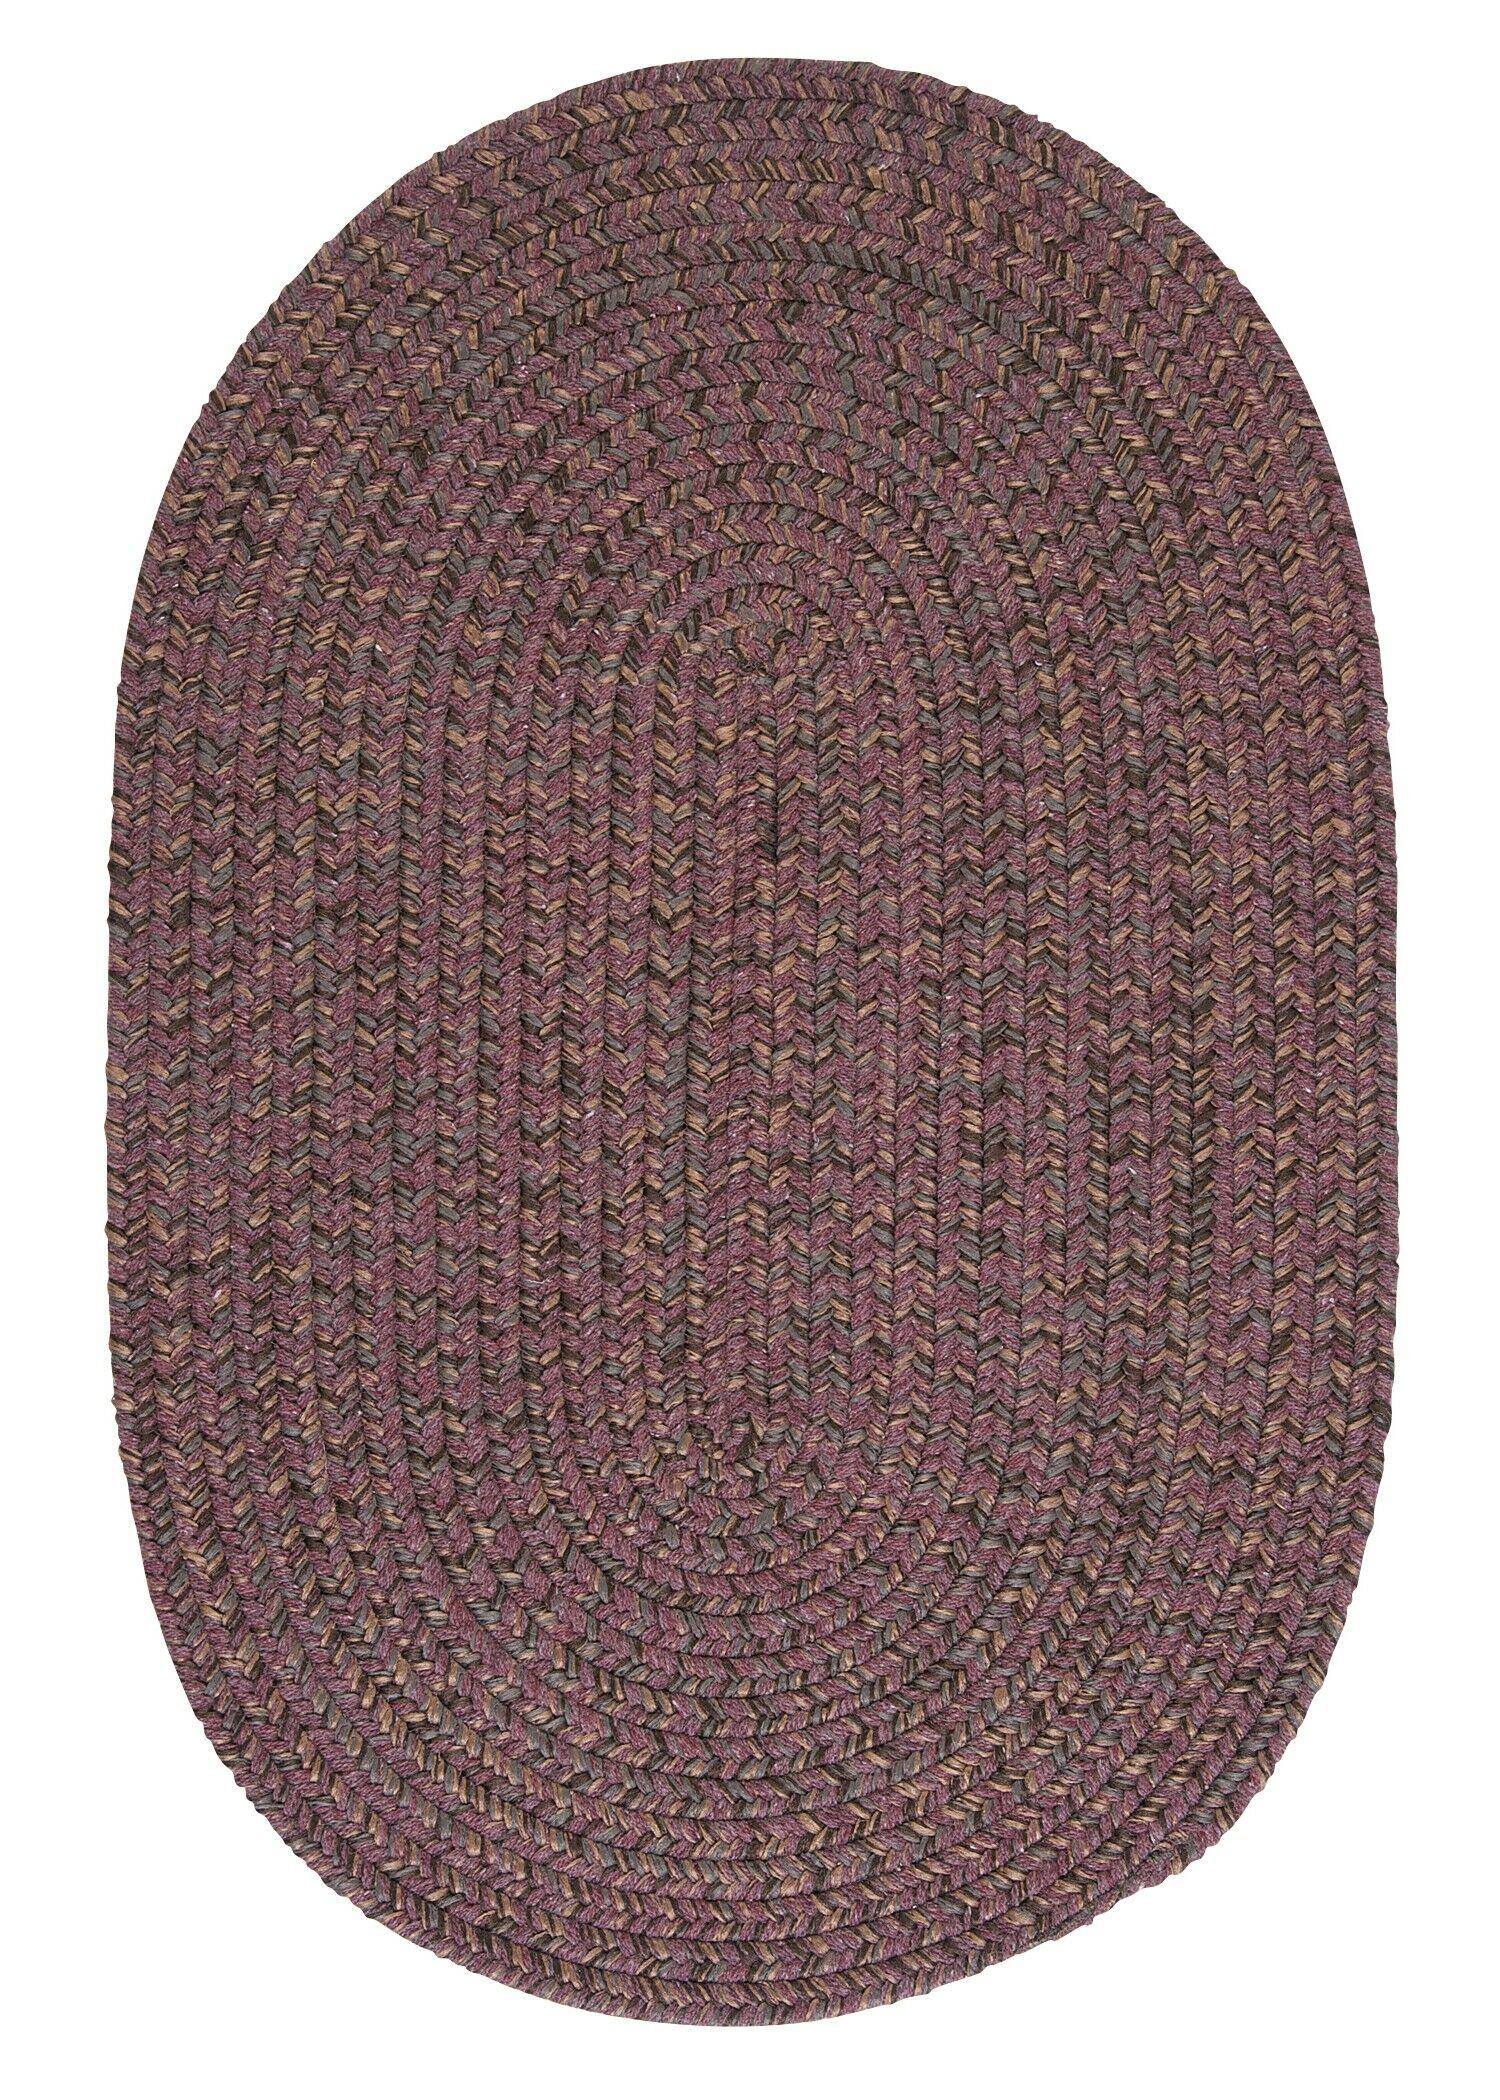 Abey Plum Purple Area Rug Rug Size: Round 8'